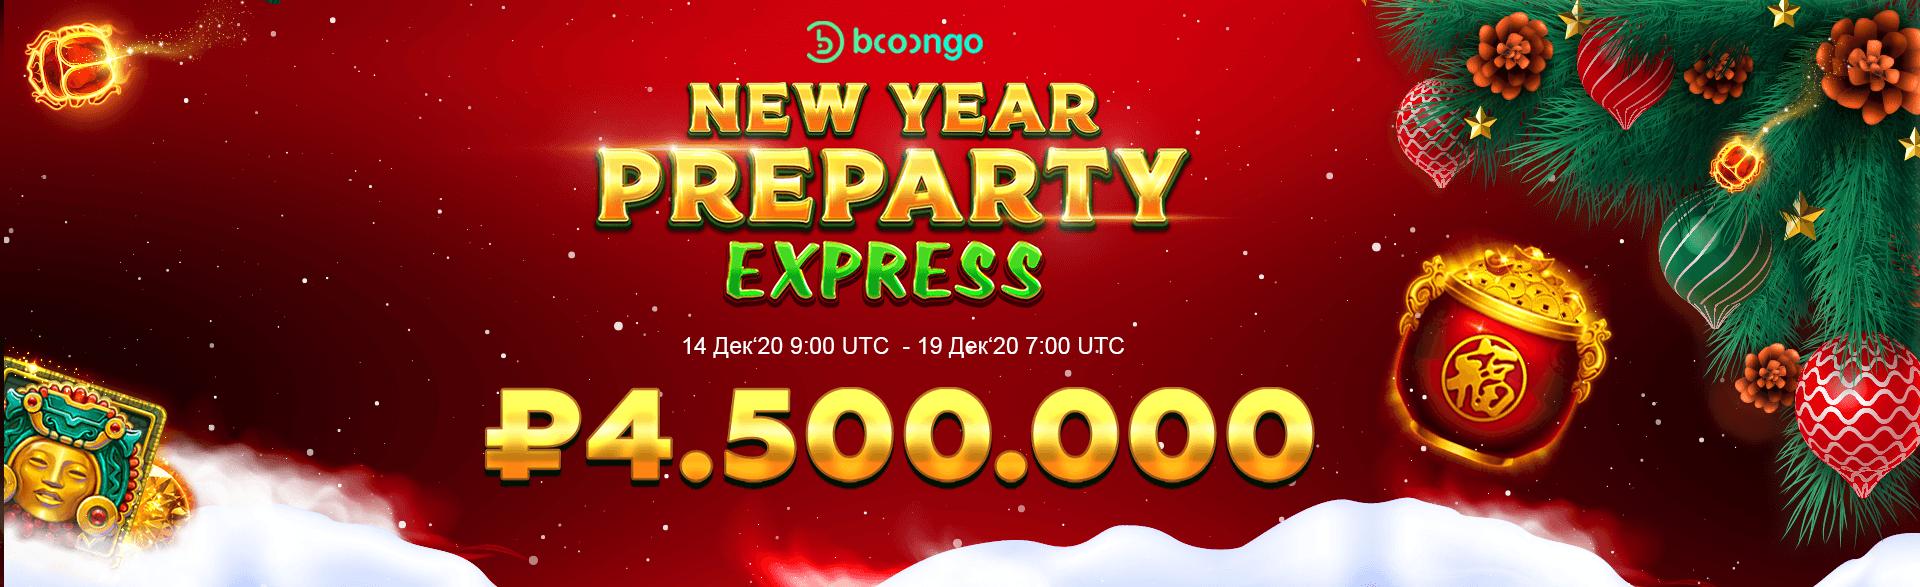 Праздничная акция New Year Pre-Party Express